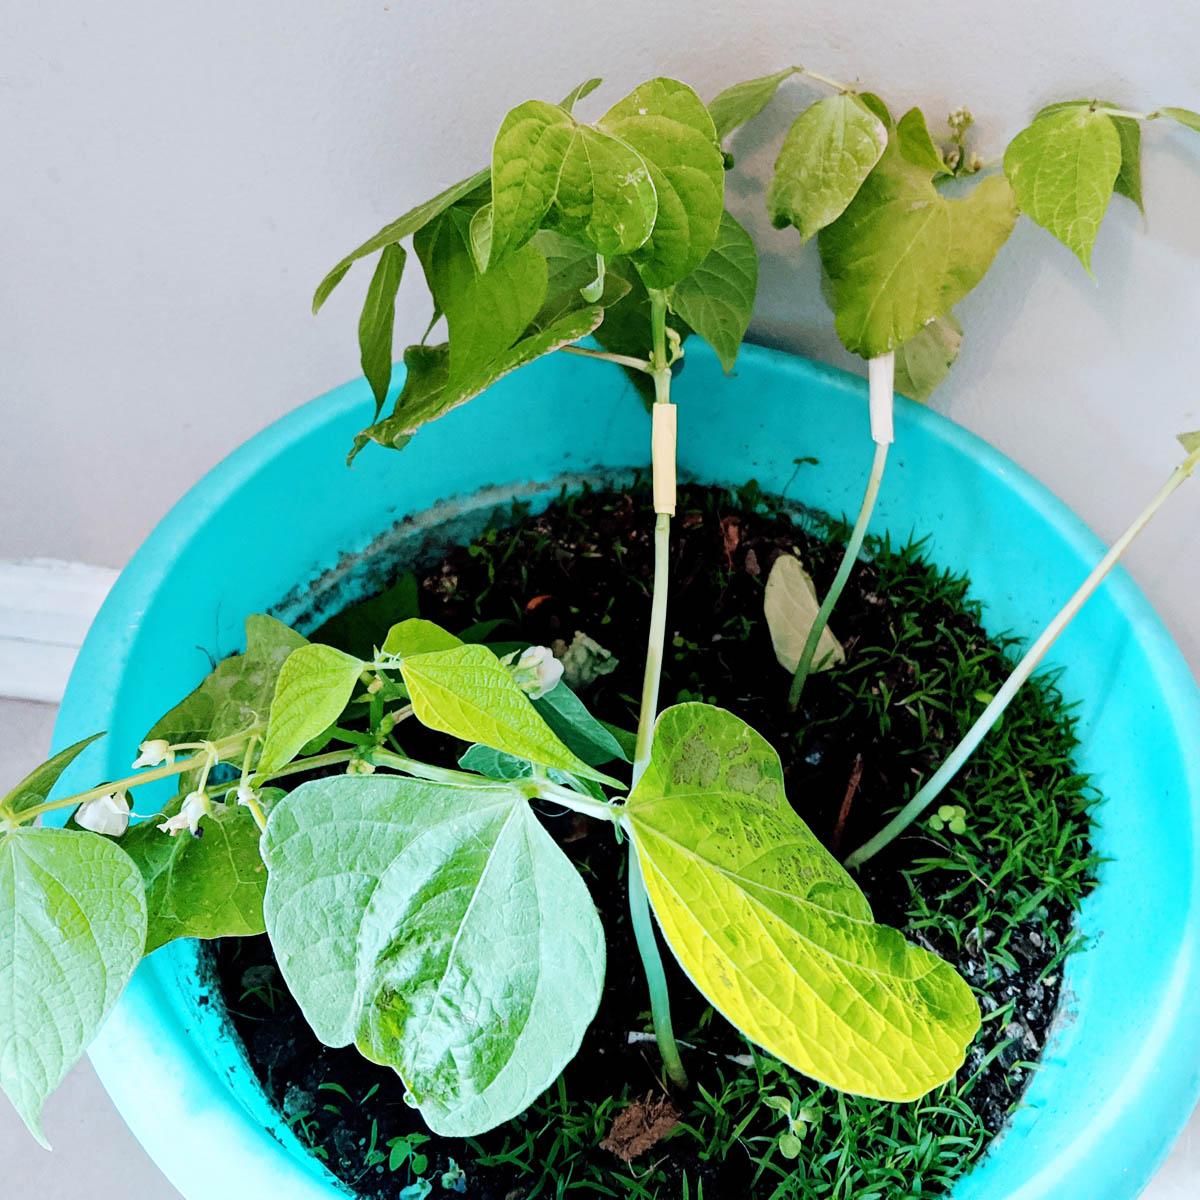 Leggy Seedlings - Bean Seedlings in a Turquoise Flower Pot with Masking Tape on the Stems